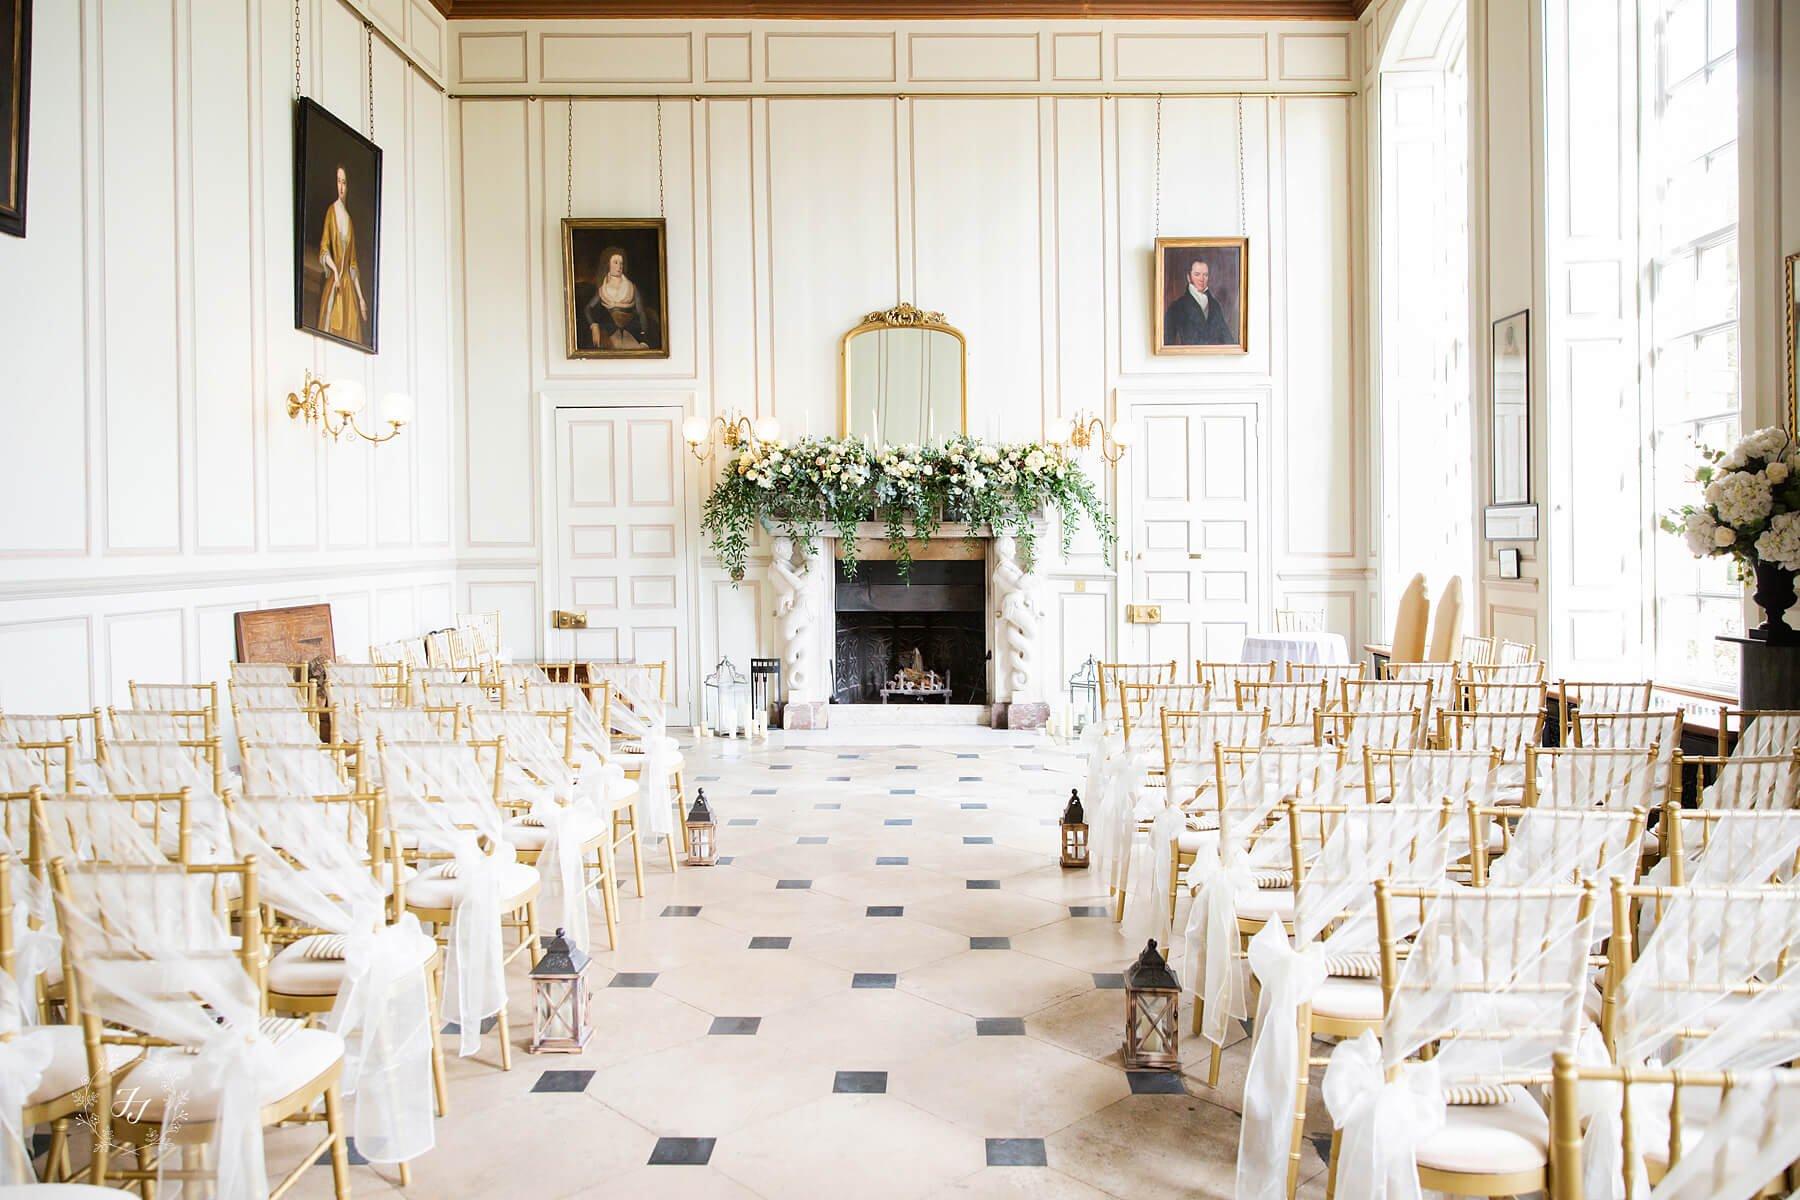 The Grand Salon Ceremony Room